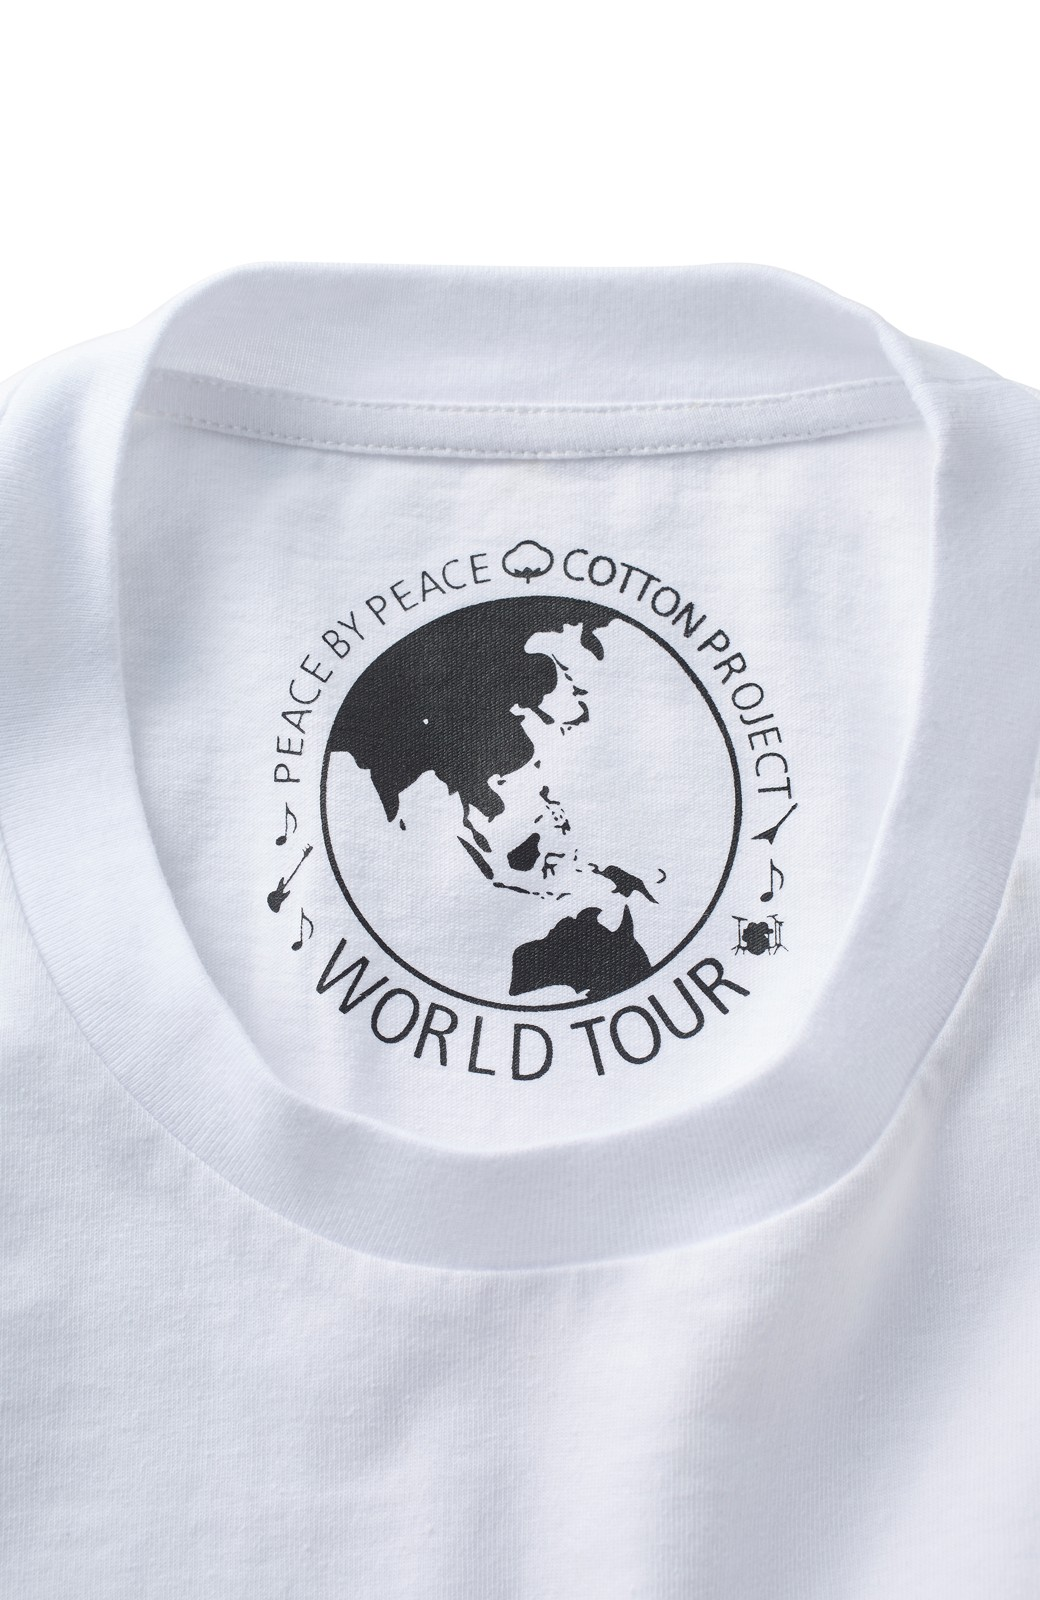 haco! PBP オーガニックコットン妄想ロックフェスTシャツ RED HOT CHILI PEPPERS (メンズ) <ホワイト>の商品写真3